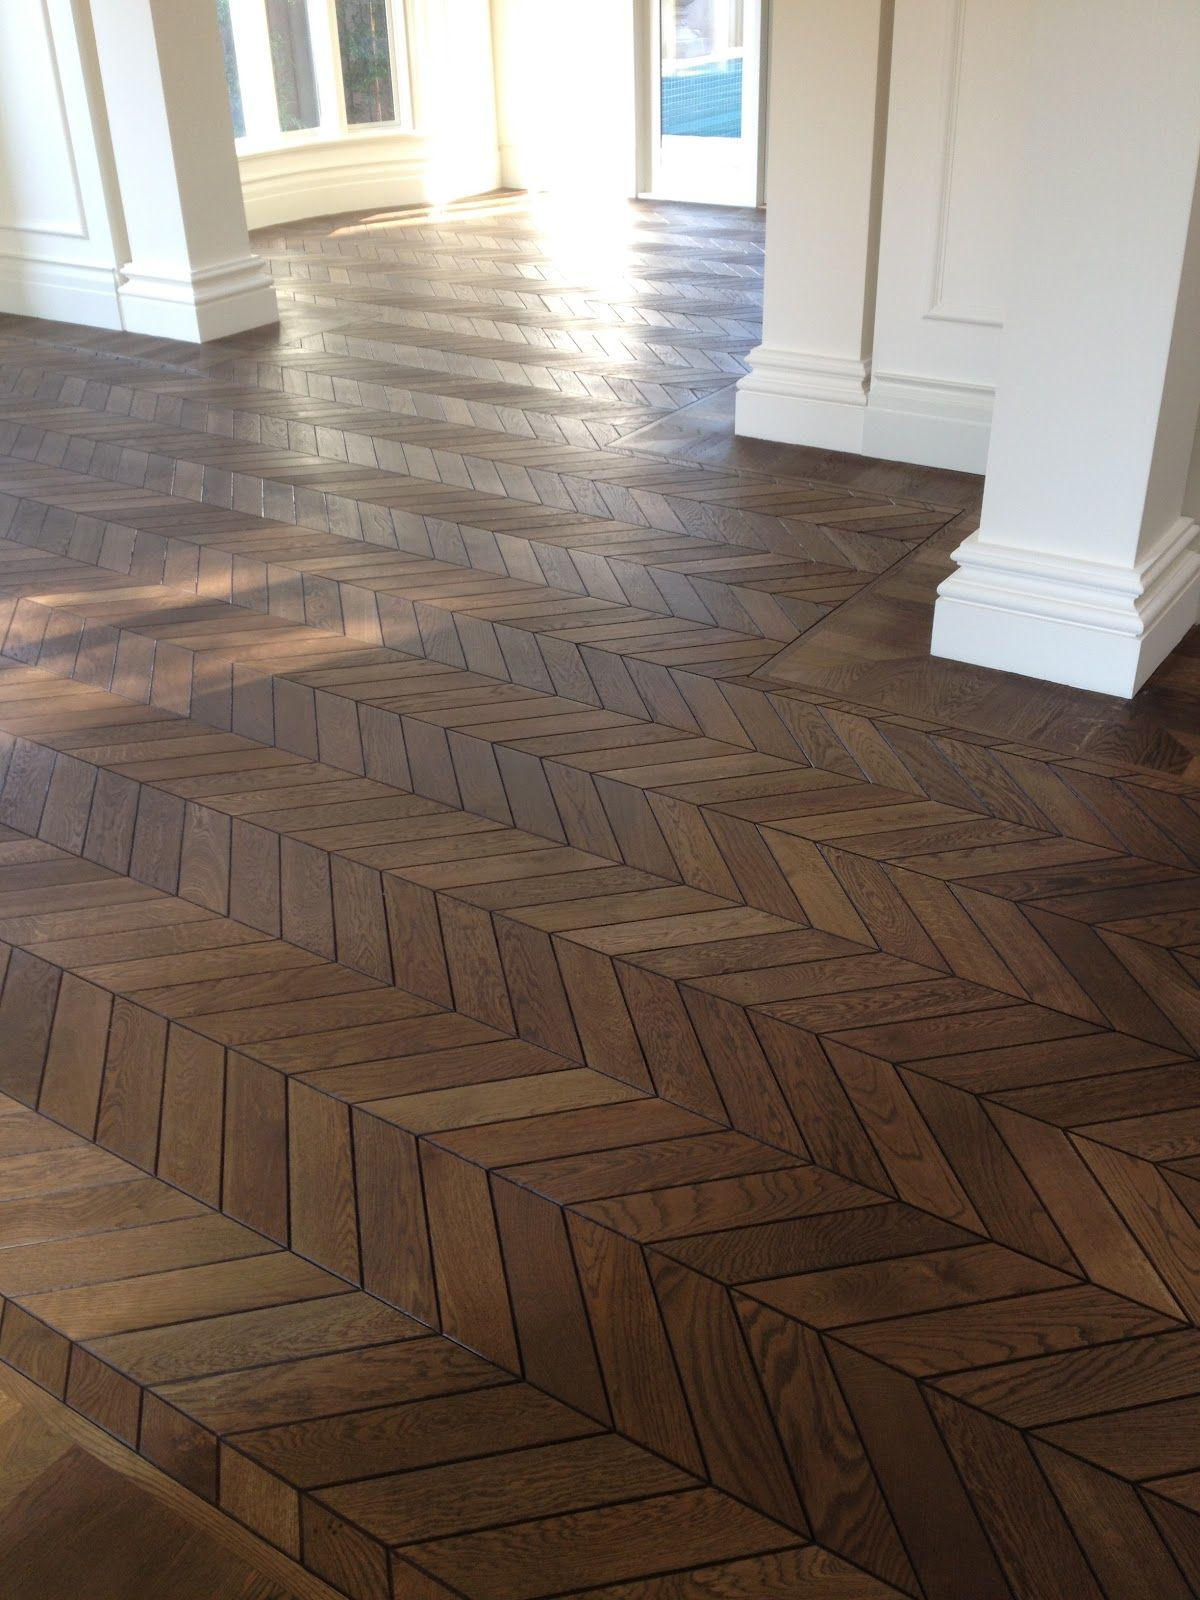 Chevron wood floors WANNNTTT!! in 2019 Diy wood floors